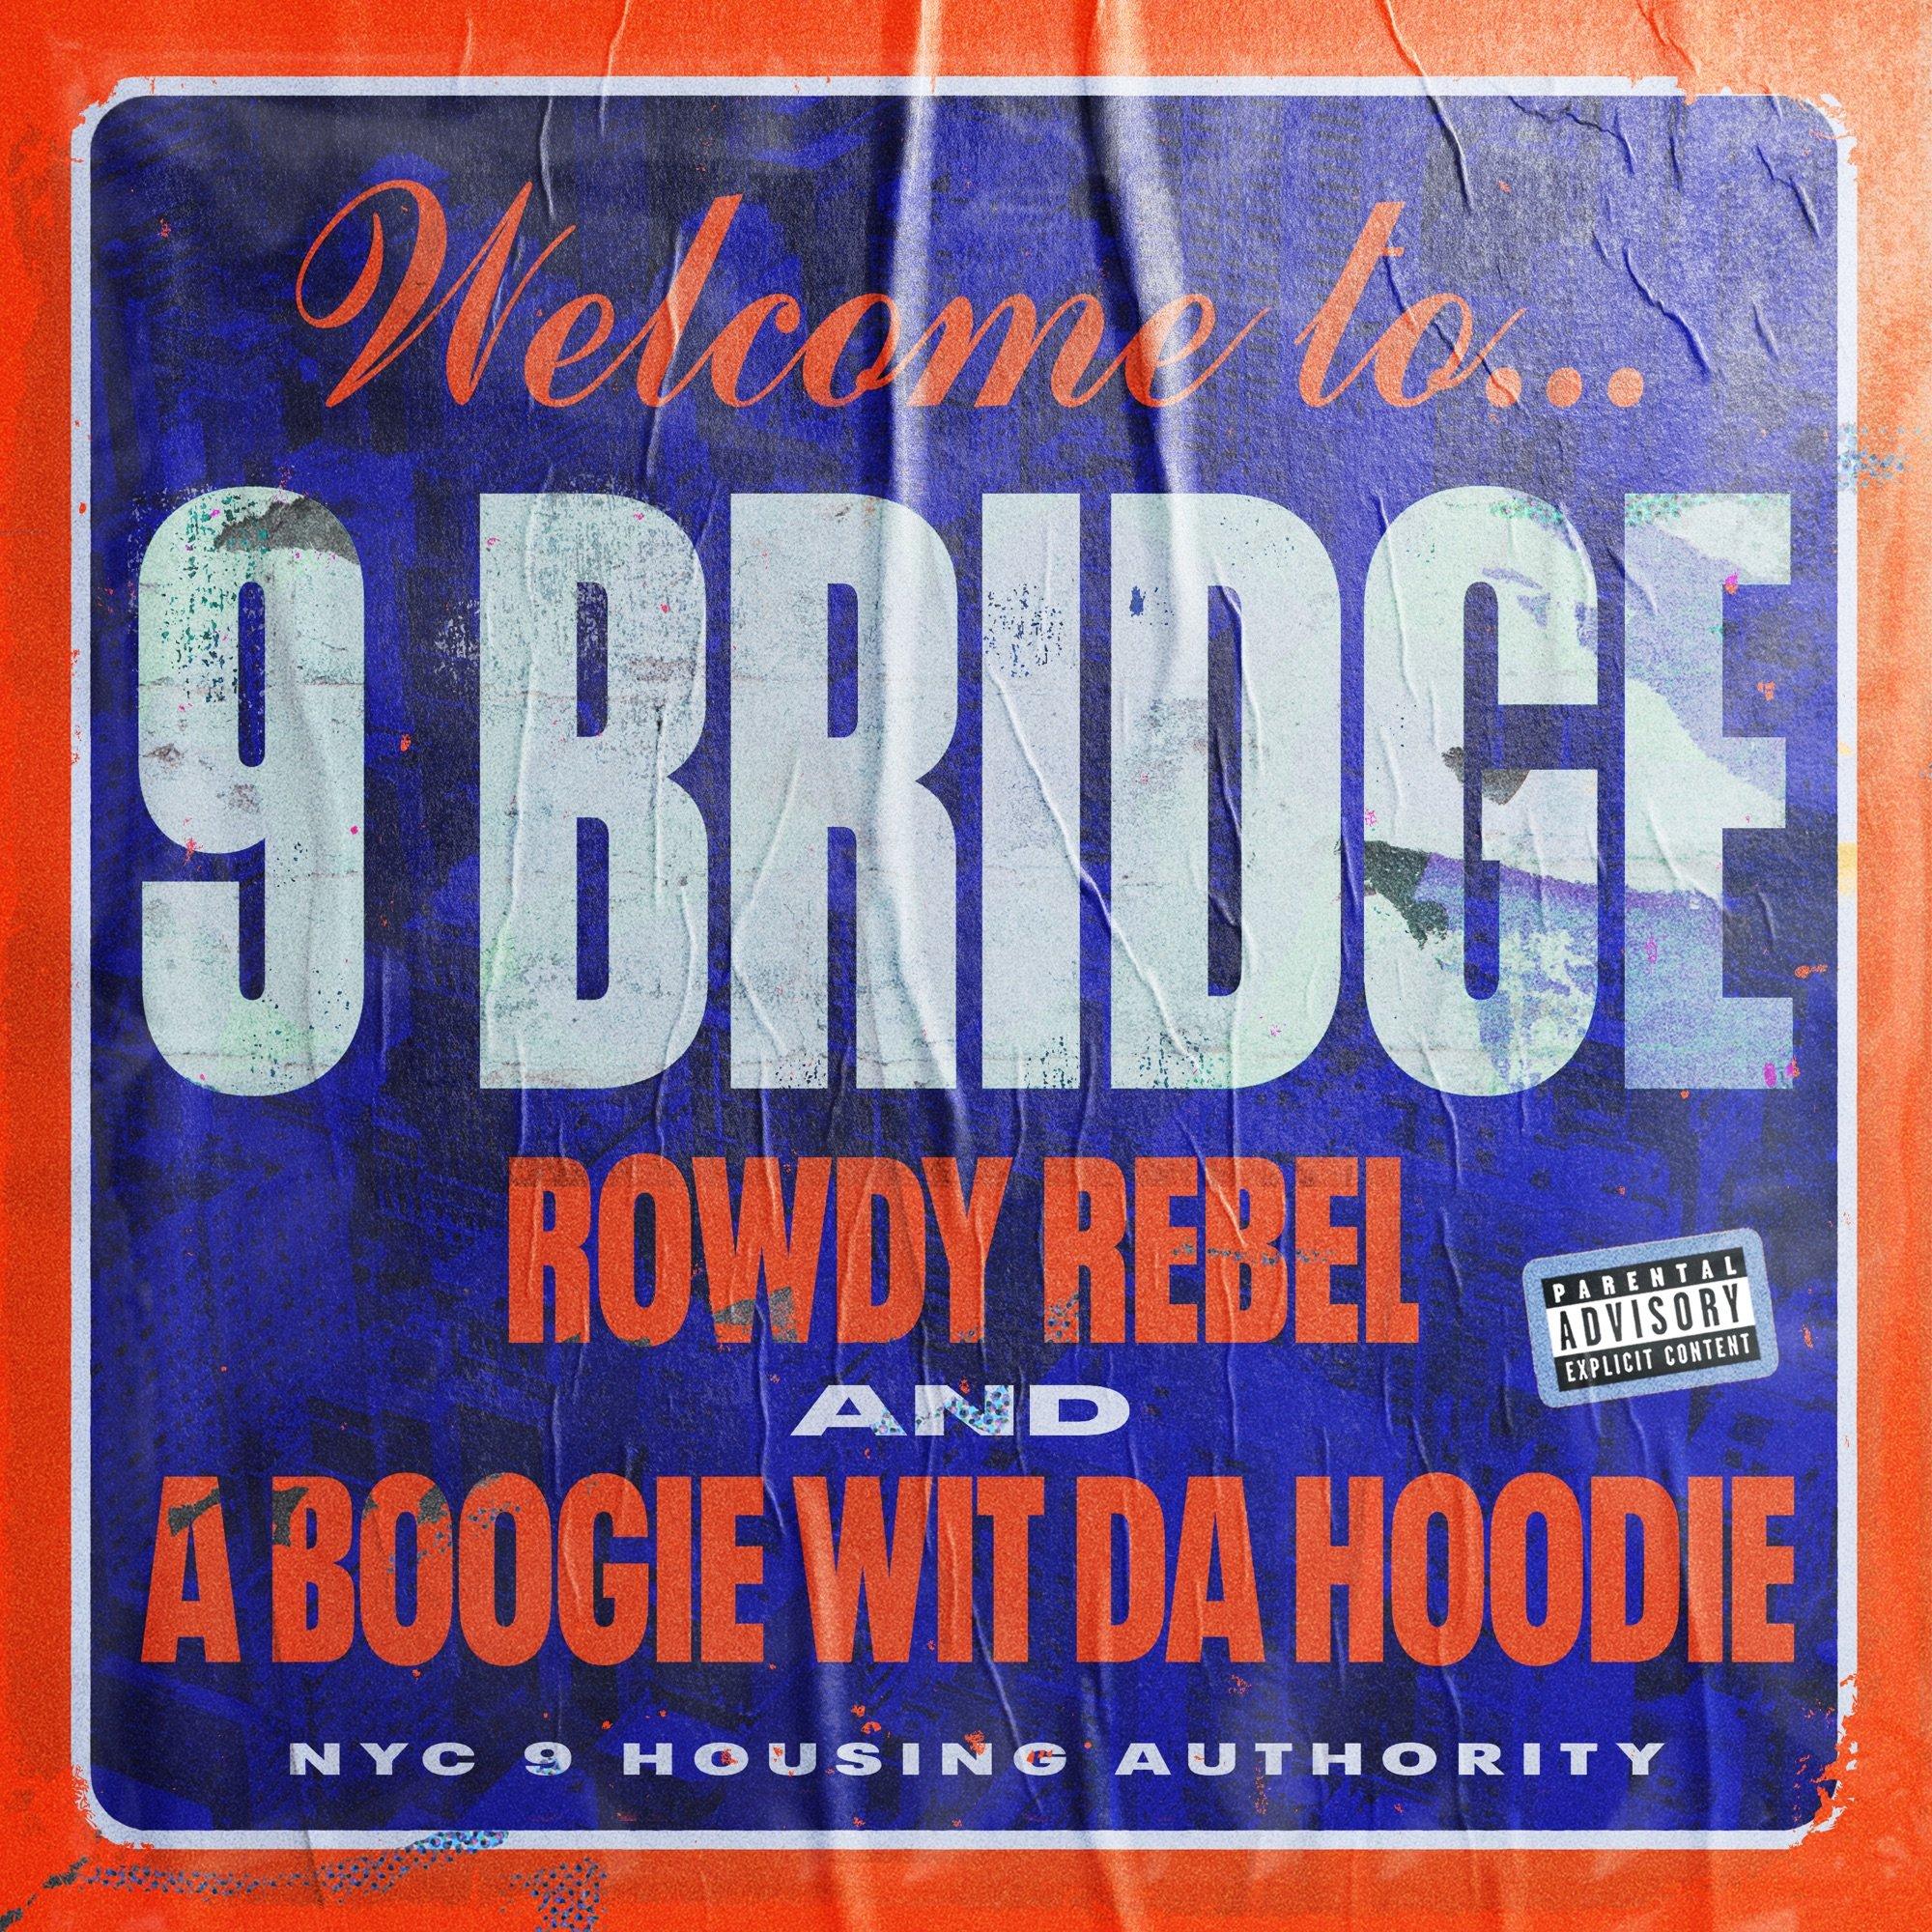 DOWNLOAD MP3: A Boogie wit da Hoodie Ft. Rowdy Rebel – 9 Bridge